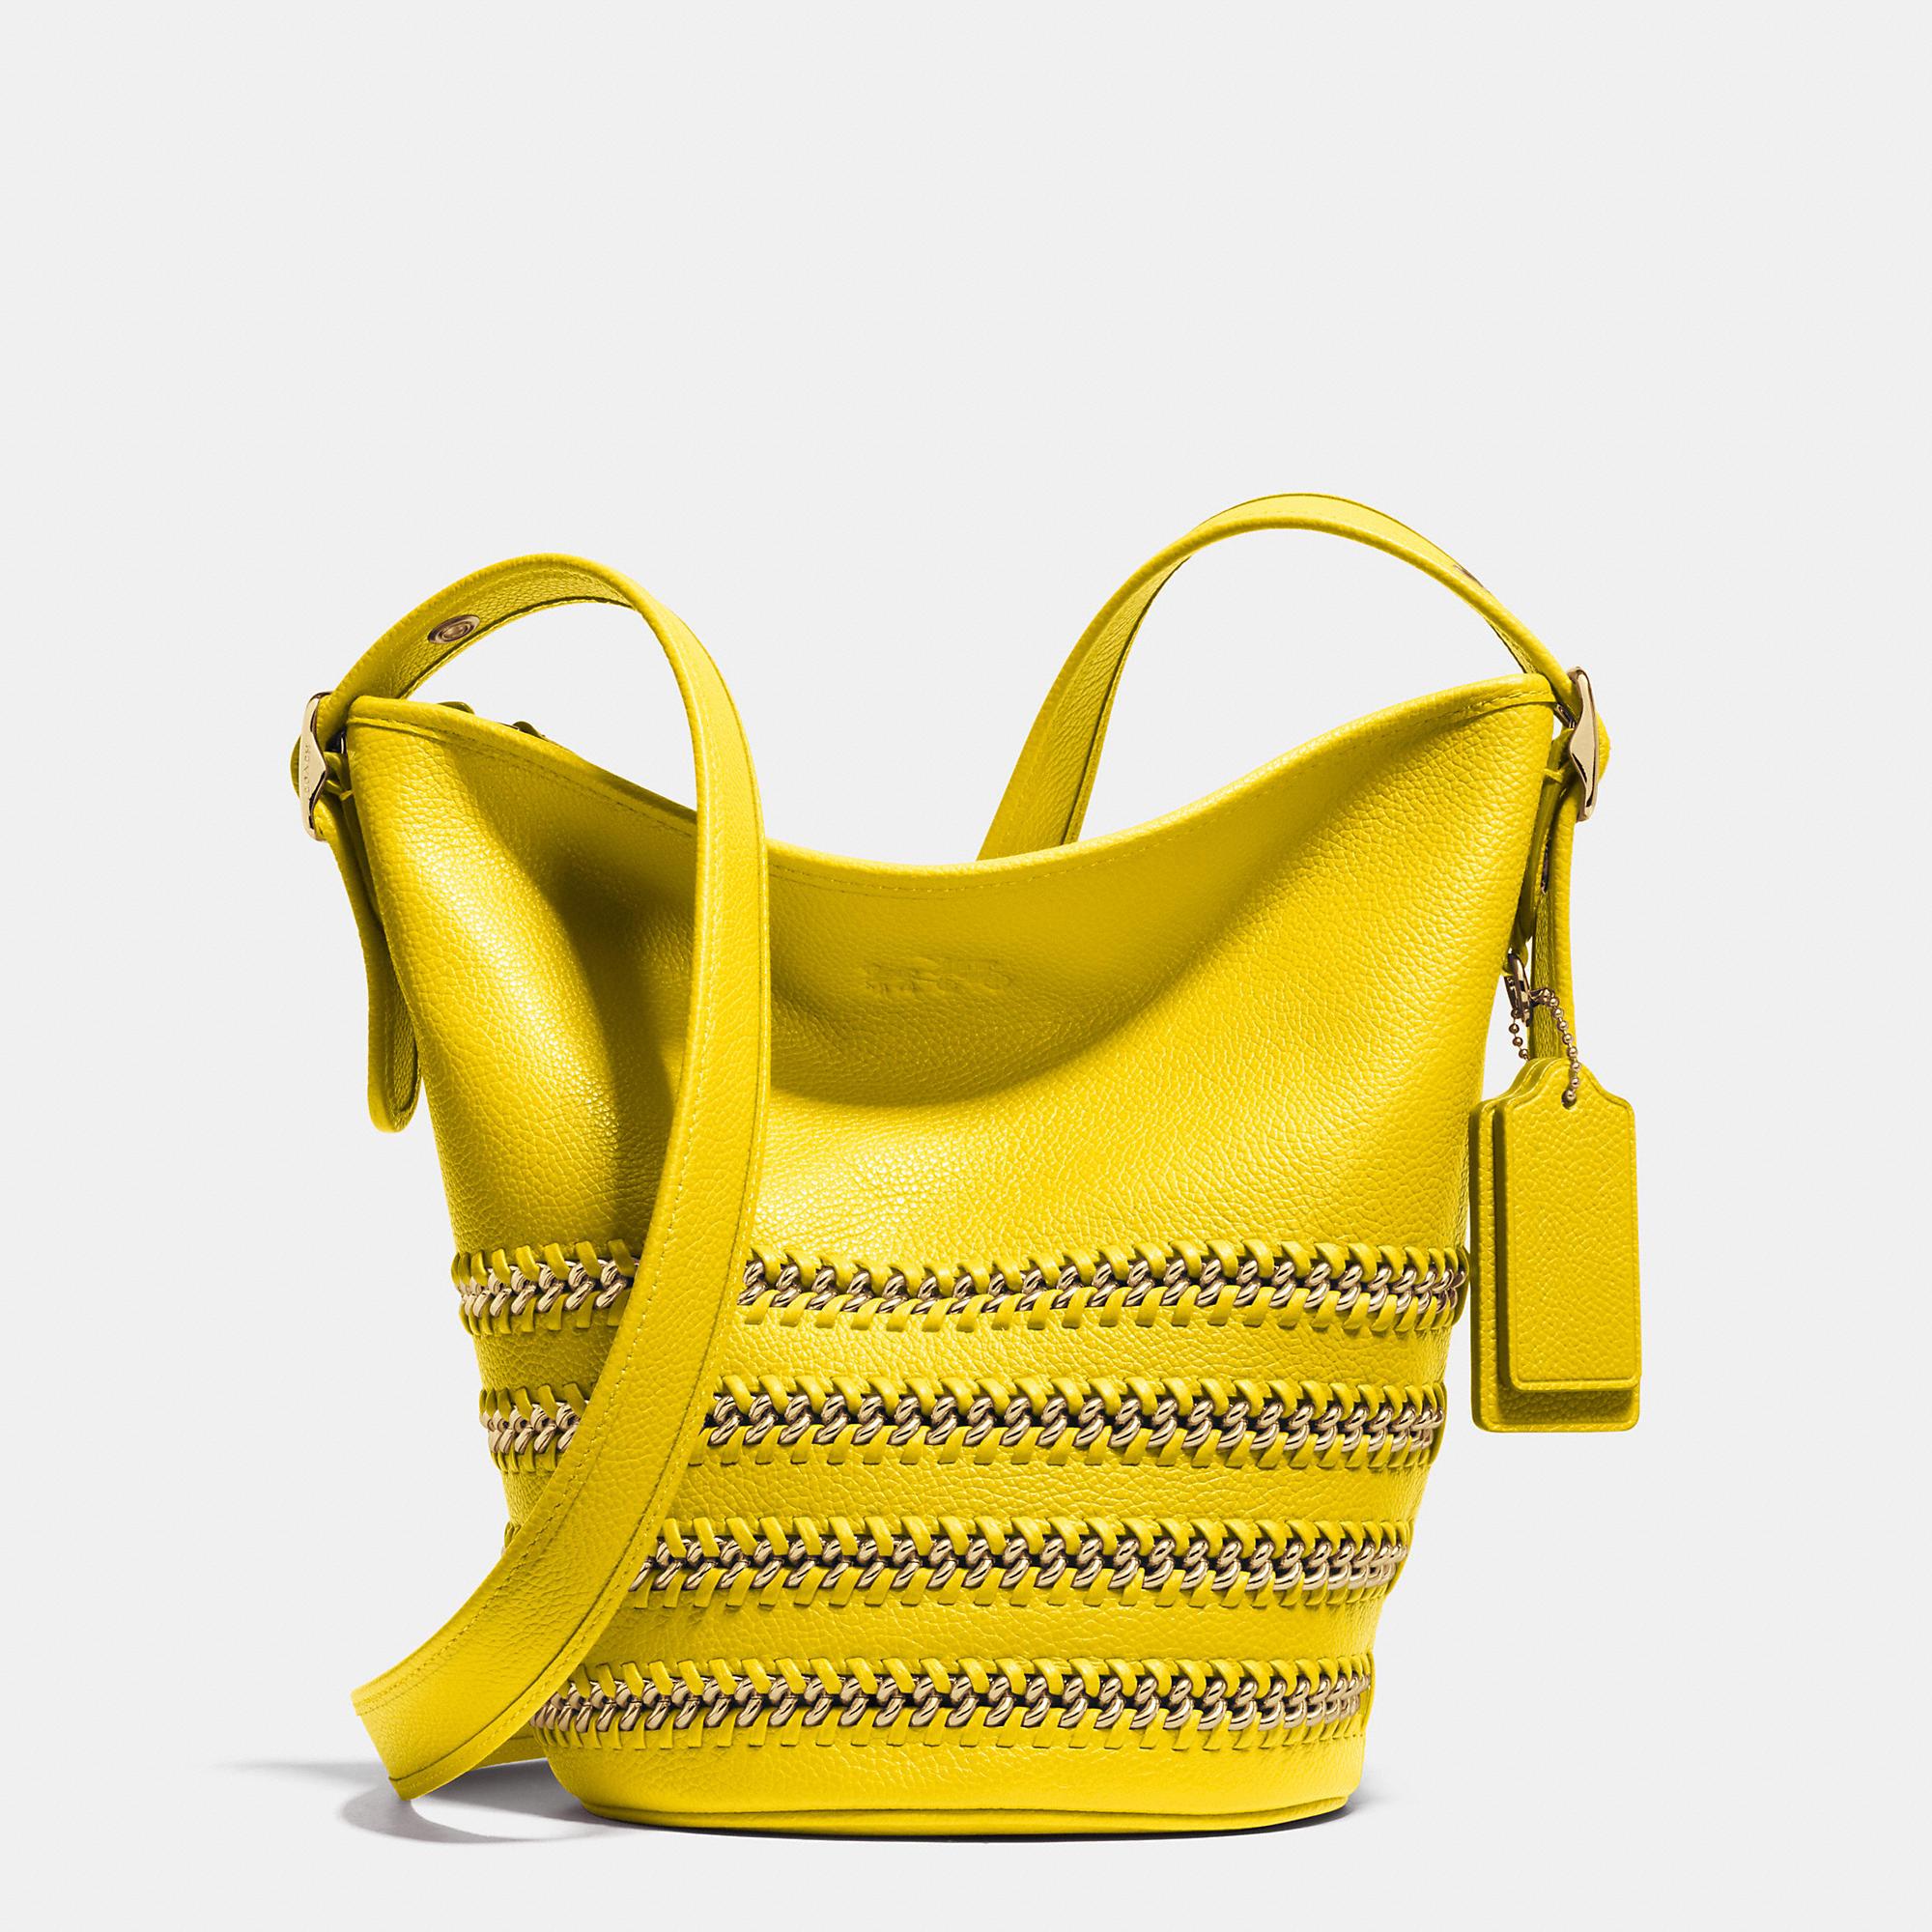 e715c3df8e Lyst - COACH Mini Duffle In Whiplash Leather in Yellow